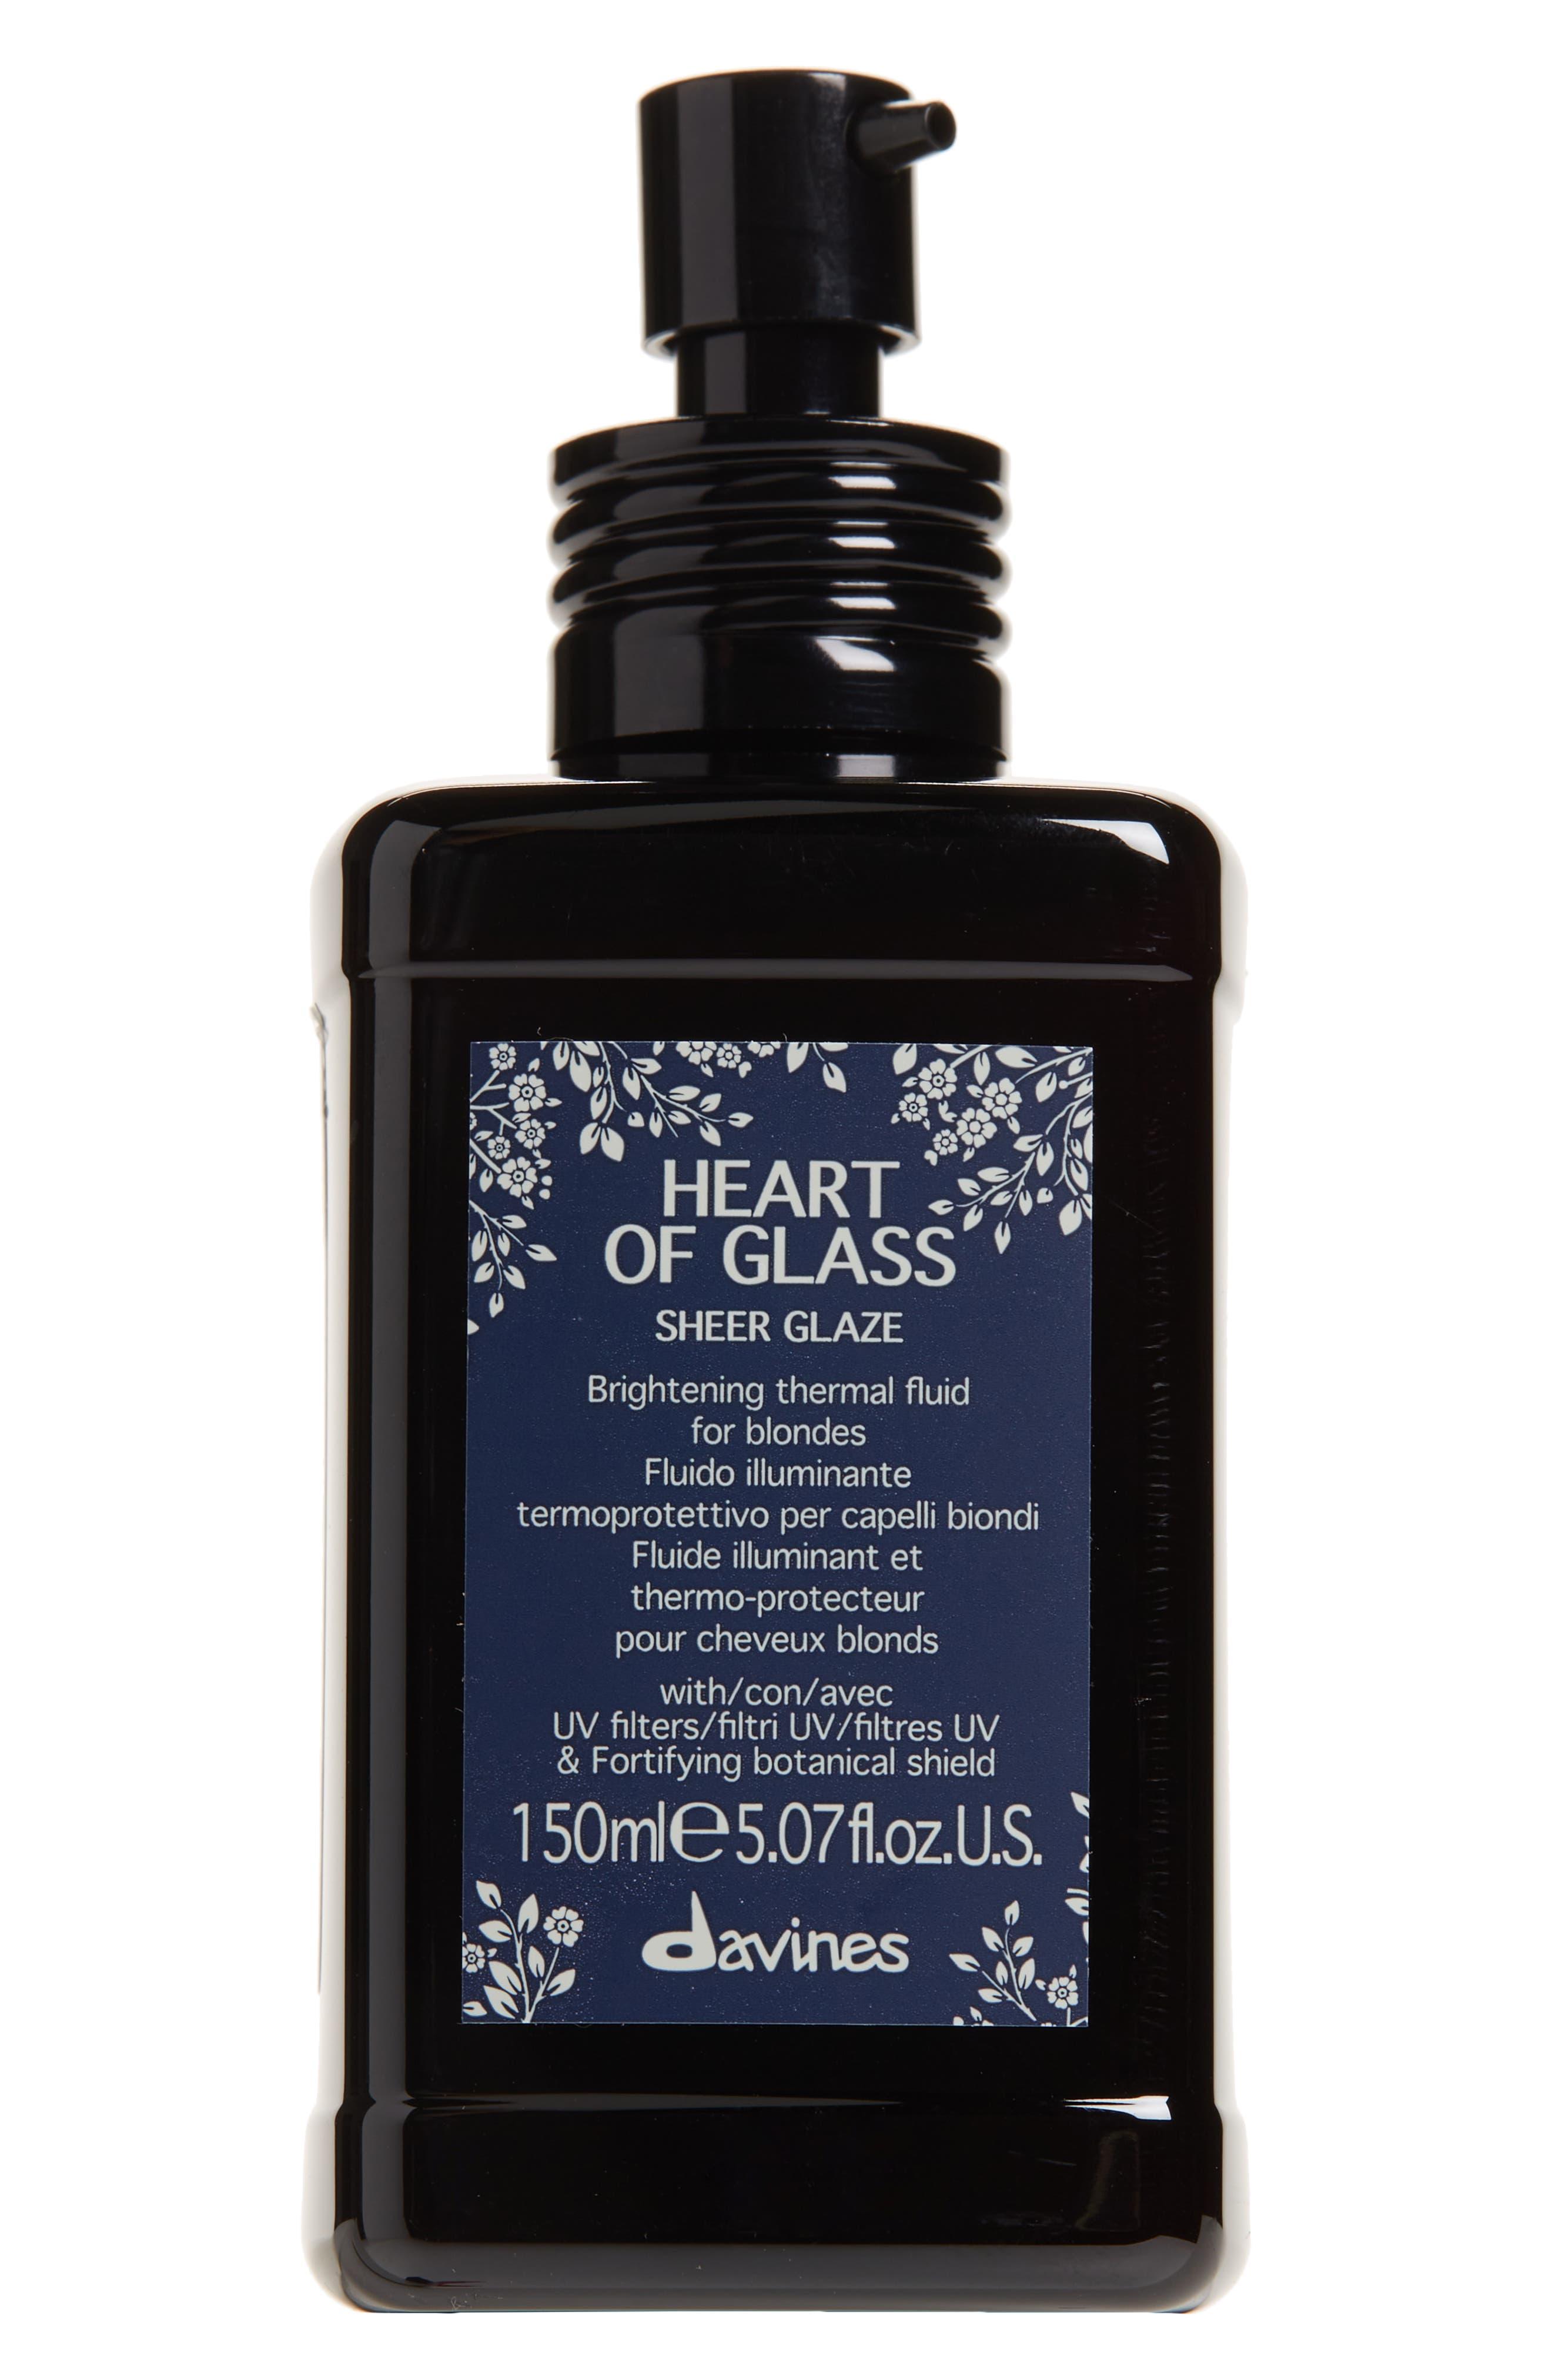 Heart of Glass Sheer Glaze Brightening Thermal Fluid